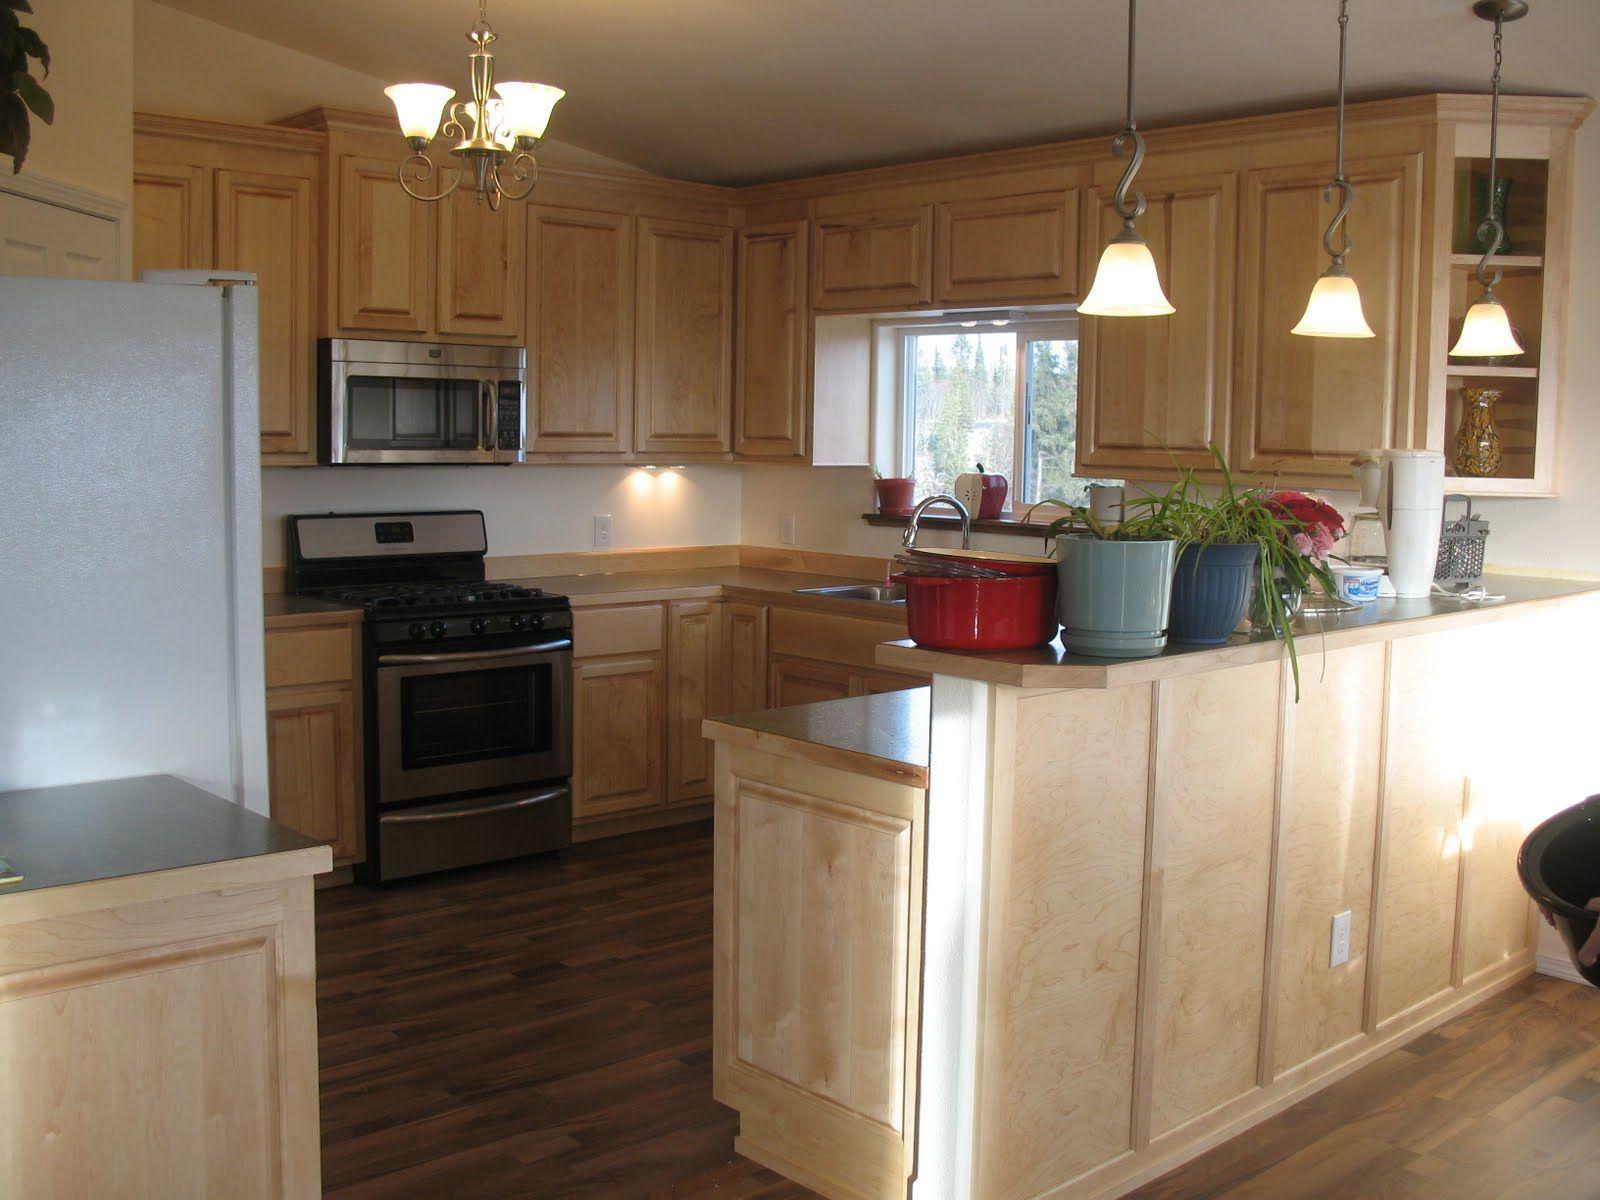 kitchen ideas maple cabinets | Maple Kitchen Cabinets ... on Maple Cabinets Kitchen Ideas  id=28503